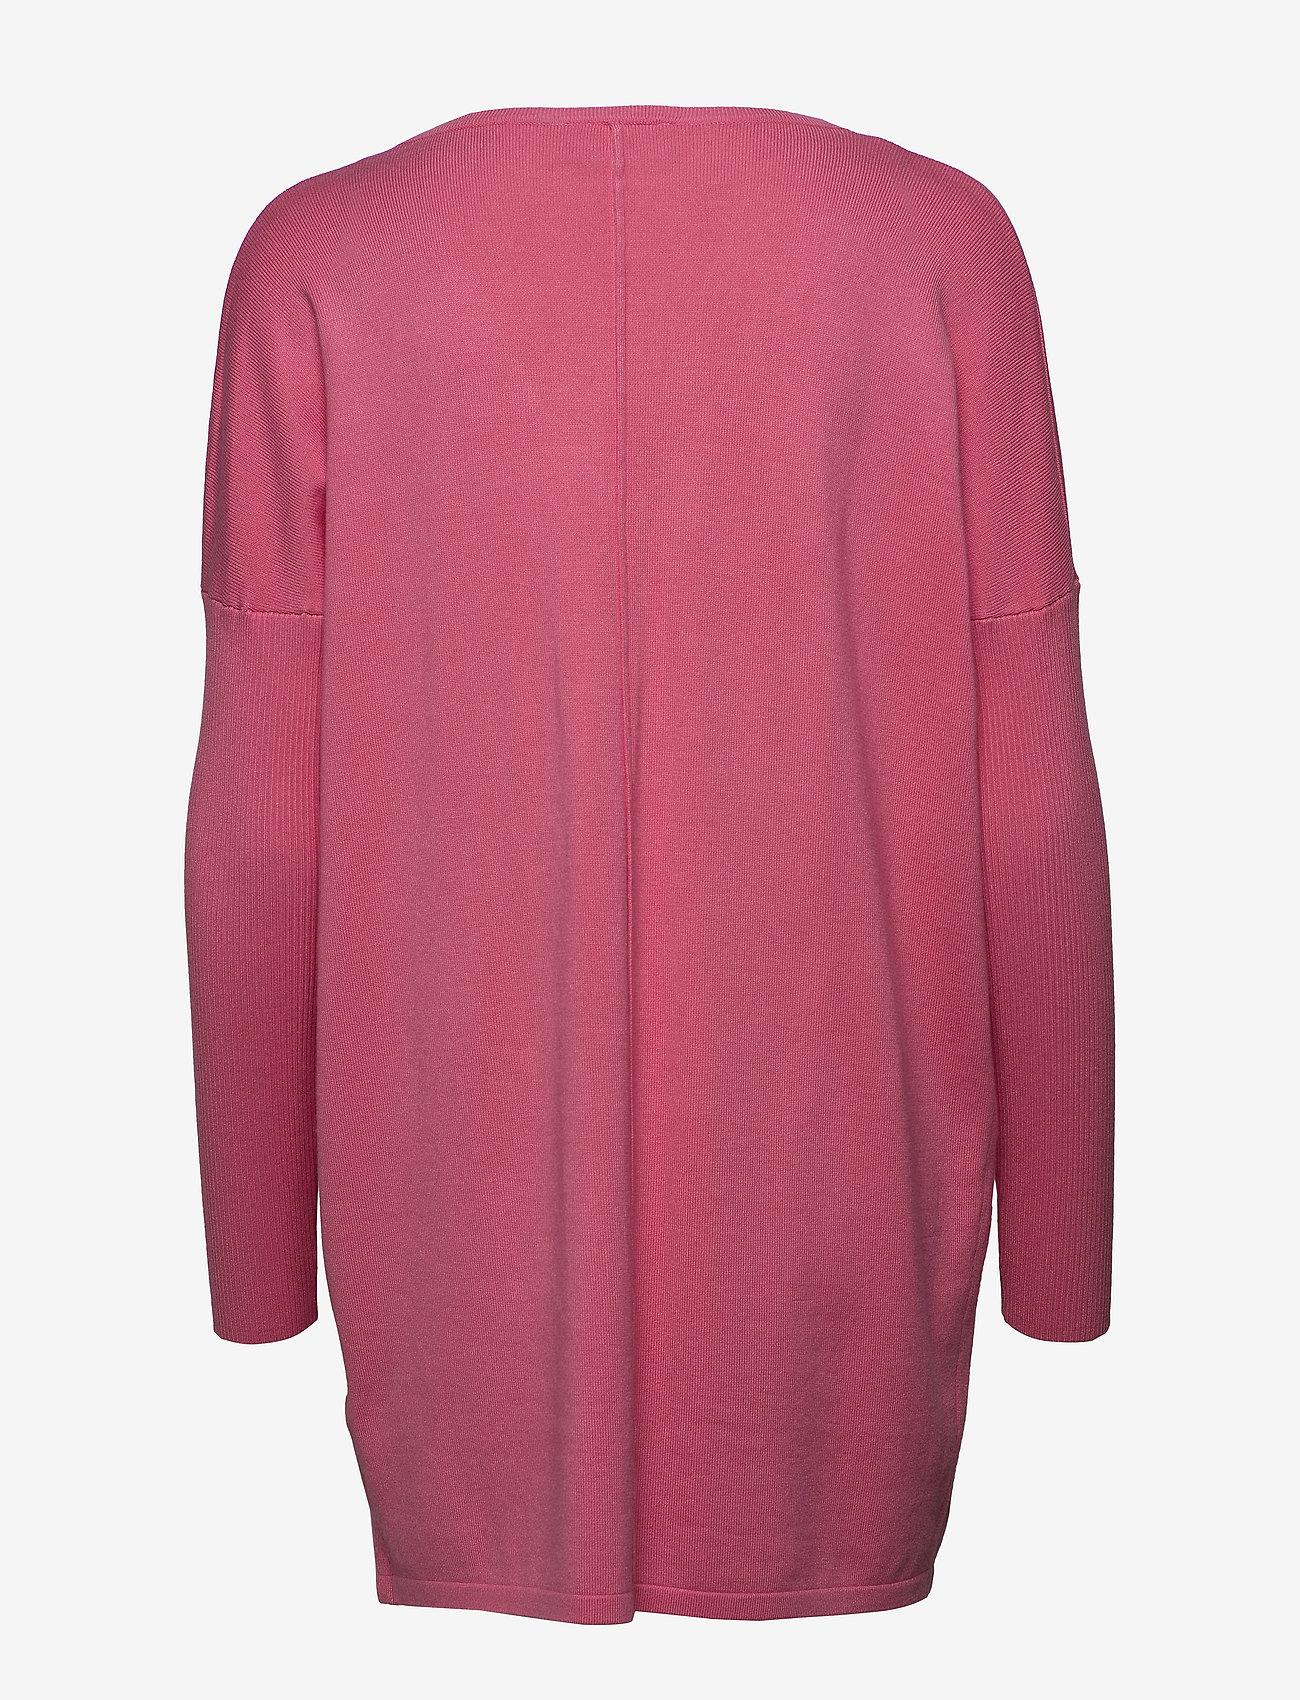 Fqjone-car (Pink Lemonade 16-1735 Tcx) - FREE/QUENT Bx25vx